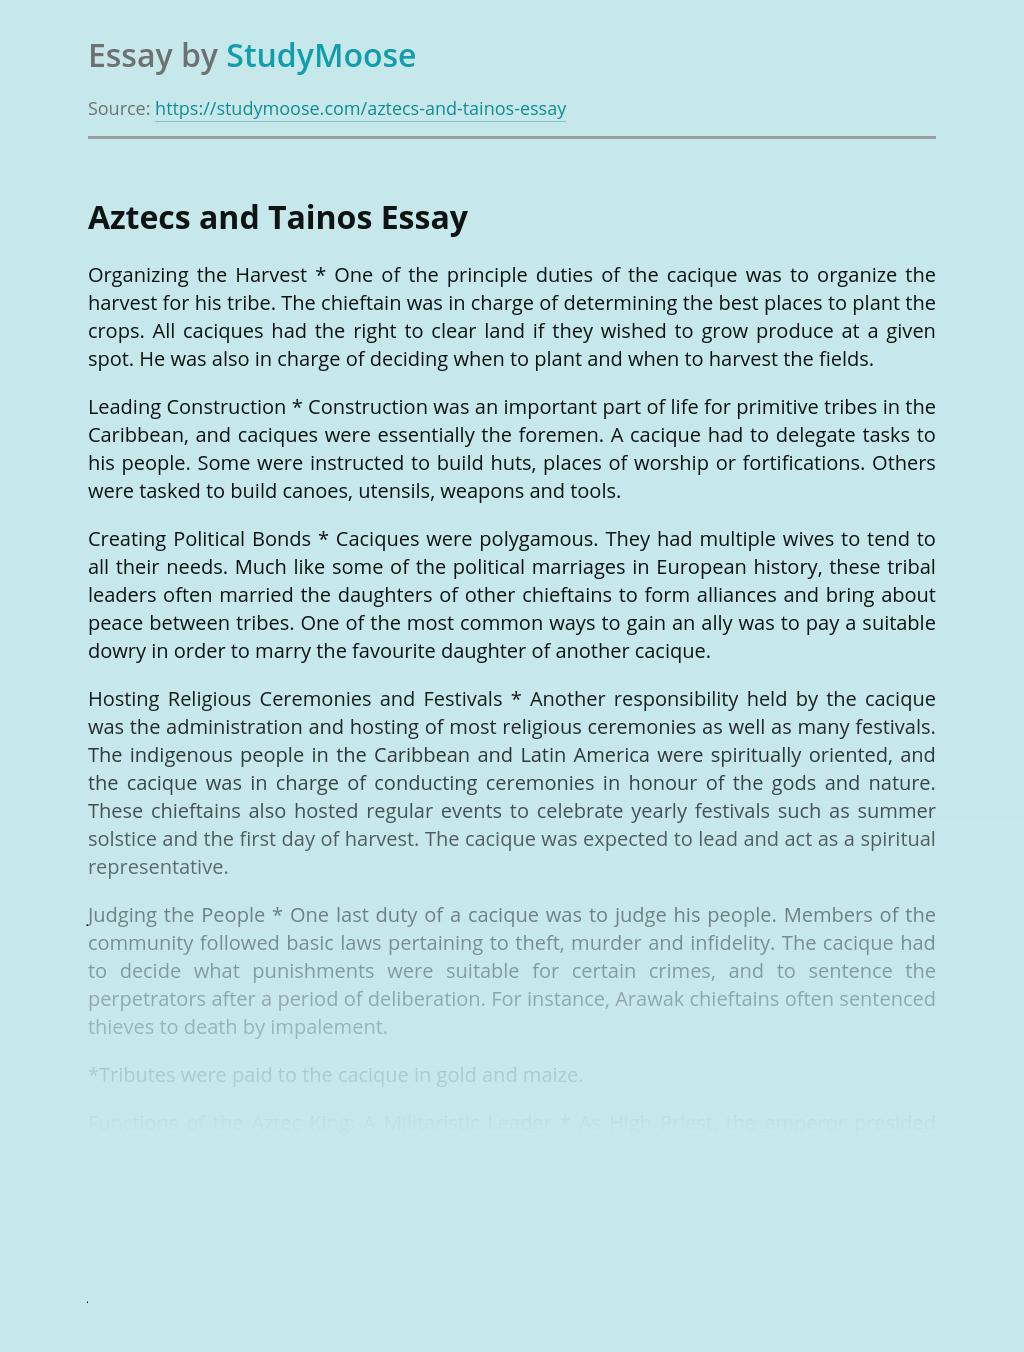 Civilization of Aztecs and Tainos Comparison